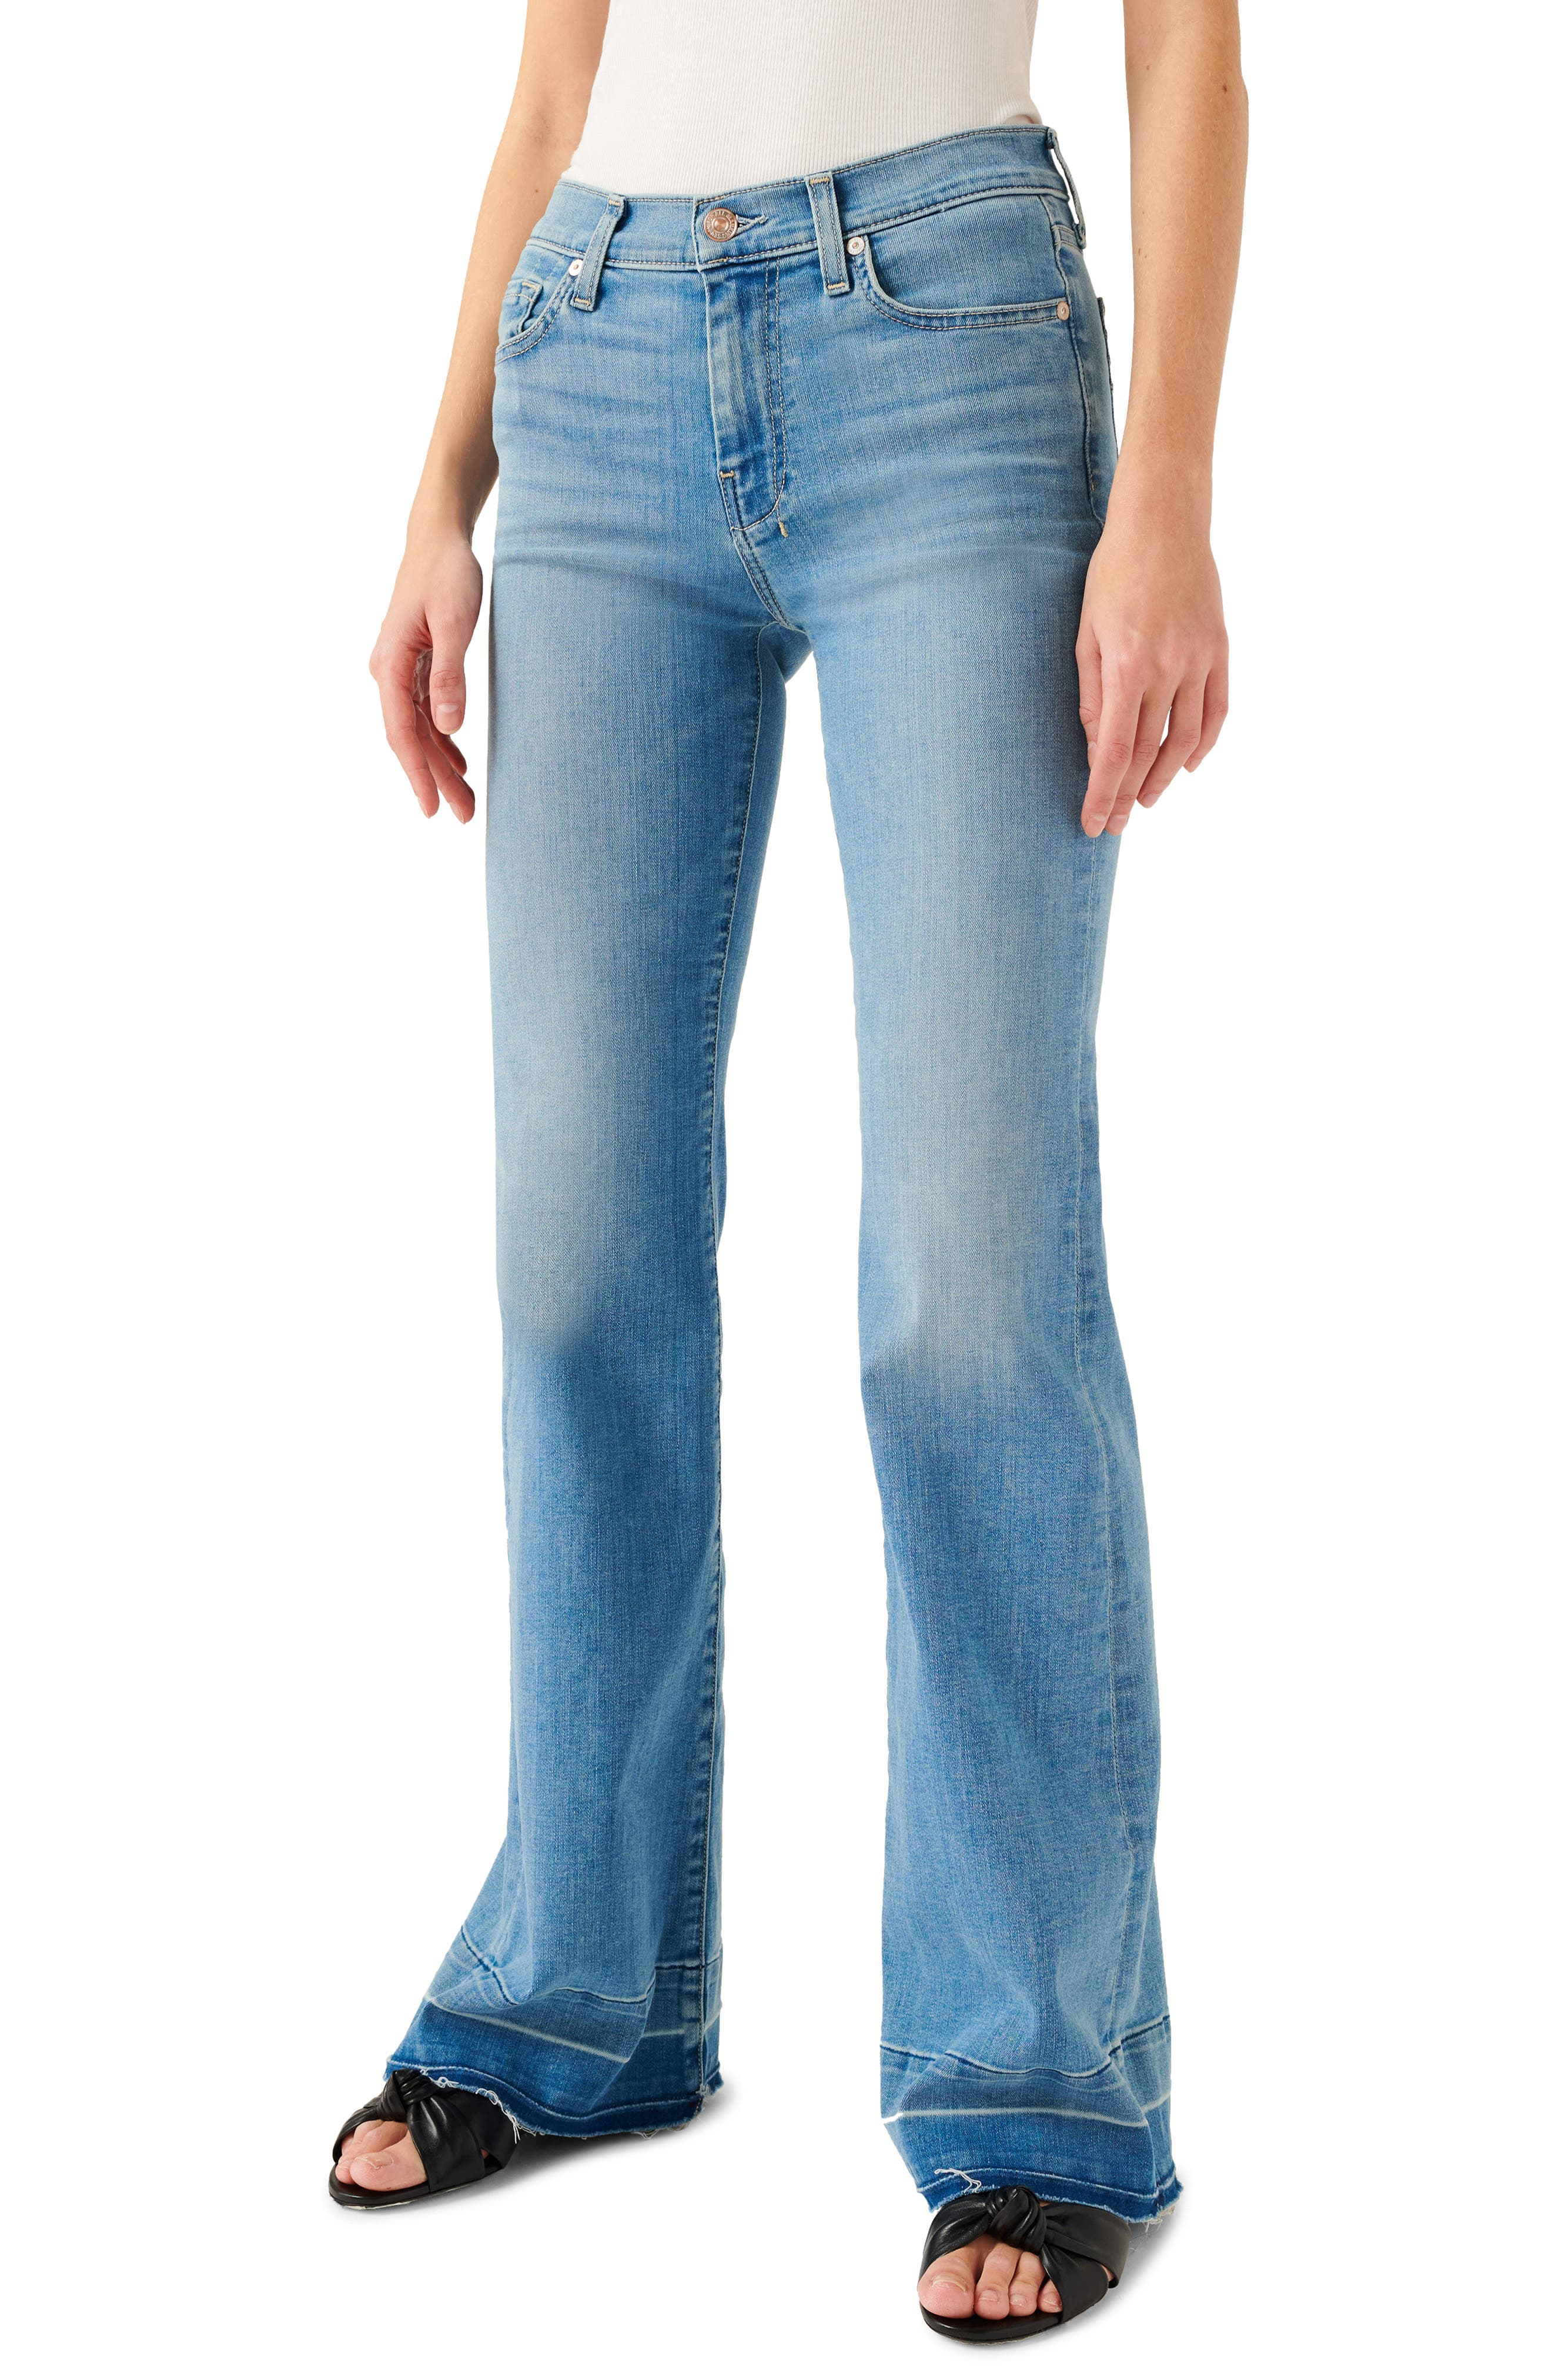 Women's 7 For All Mankind Released Fray Hem Dojo Wide Leg Jeans